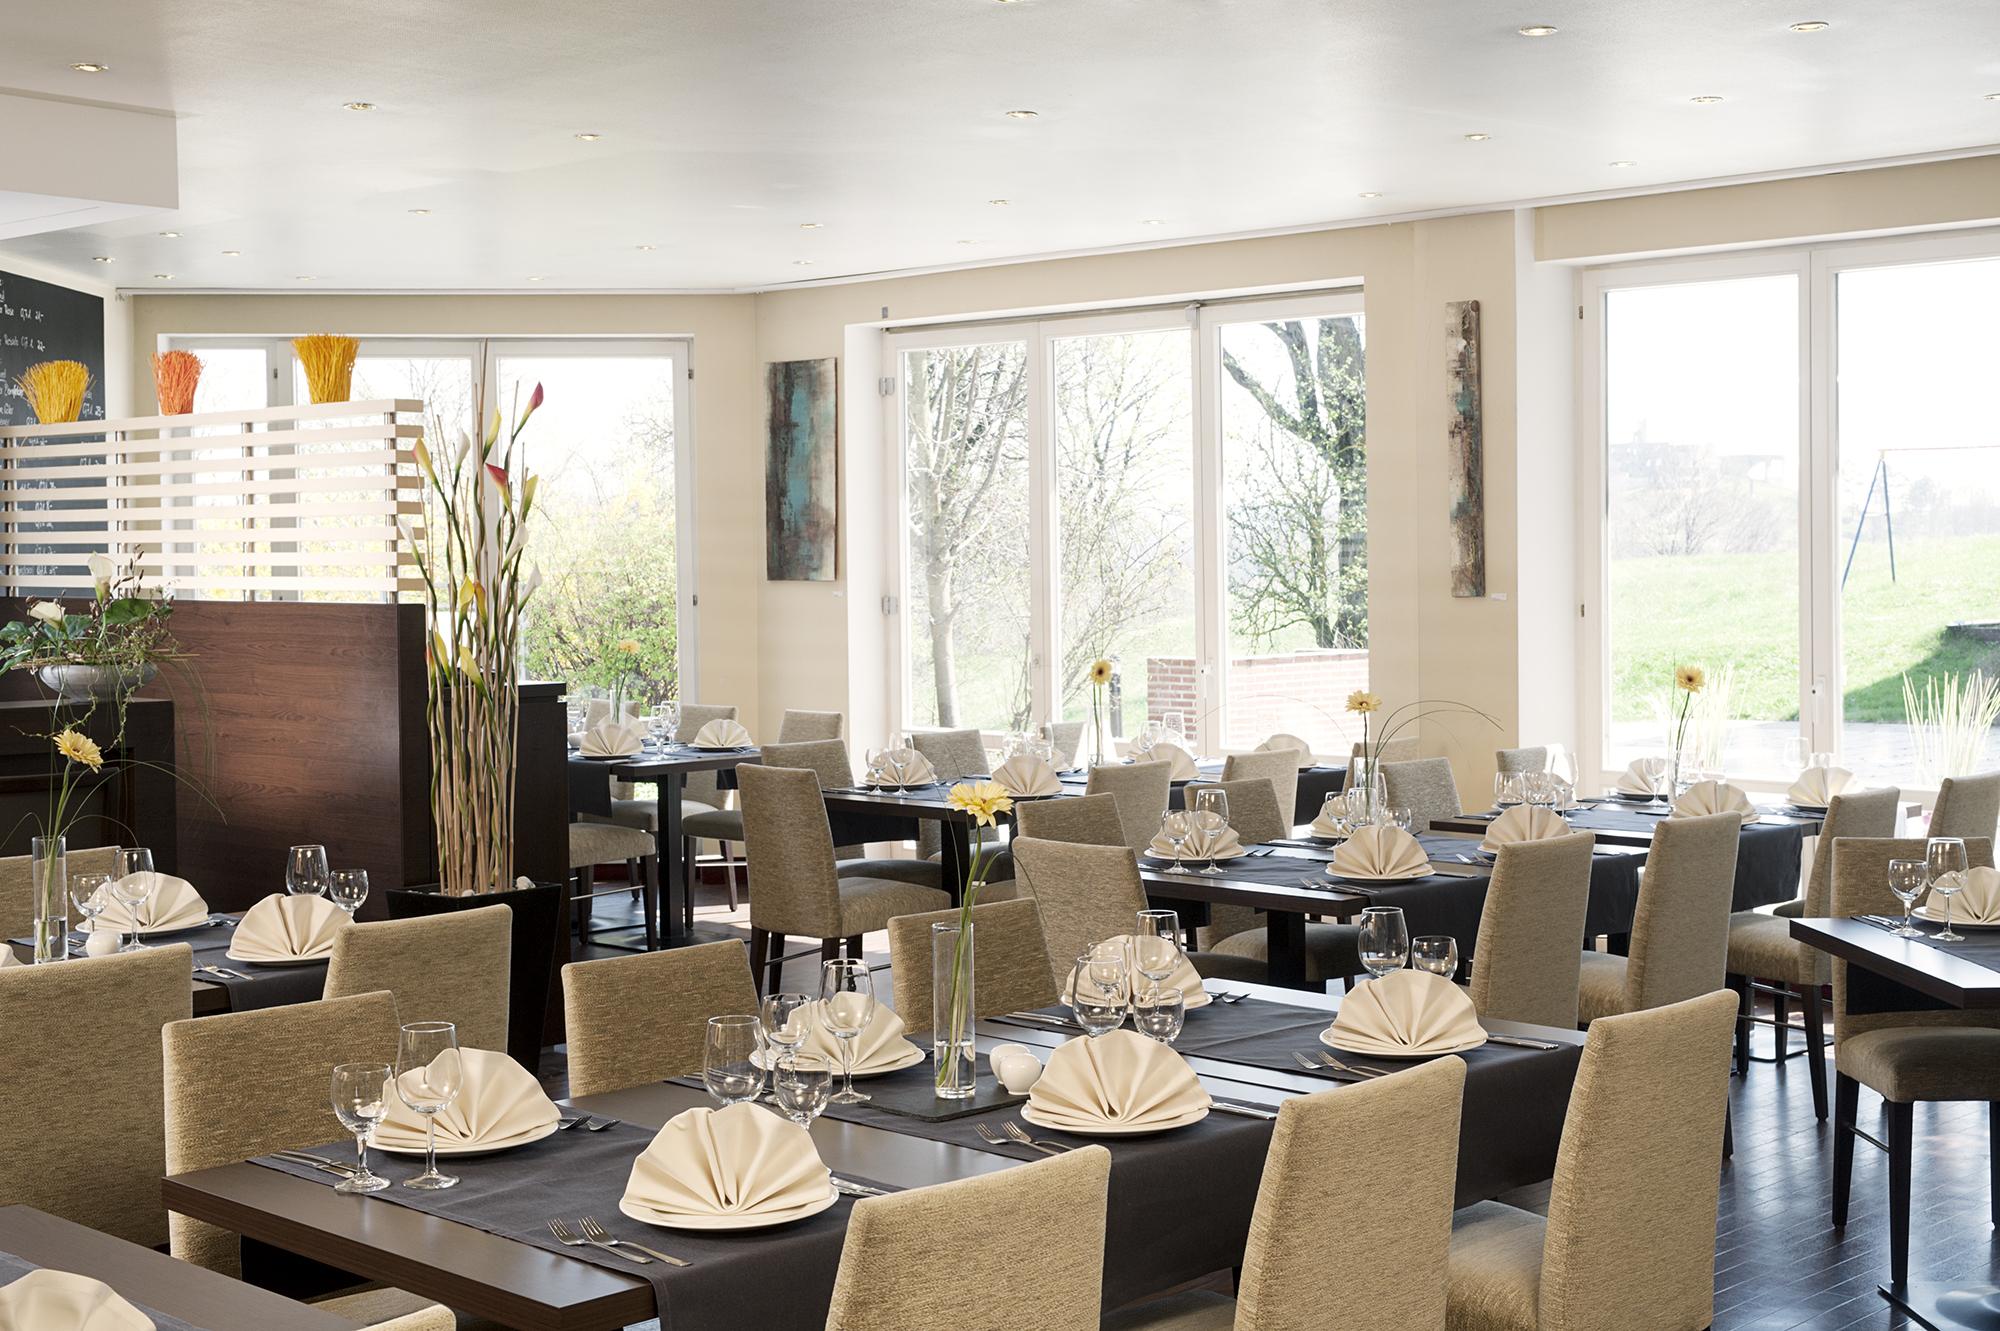 nh aquarena heidenheim restaurant nh hoteles. Black Bedroom Furniture Sets. Home Design Ideas